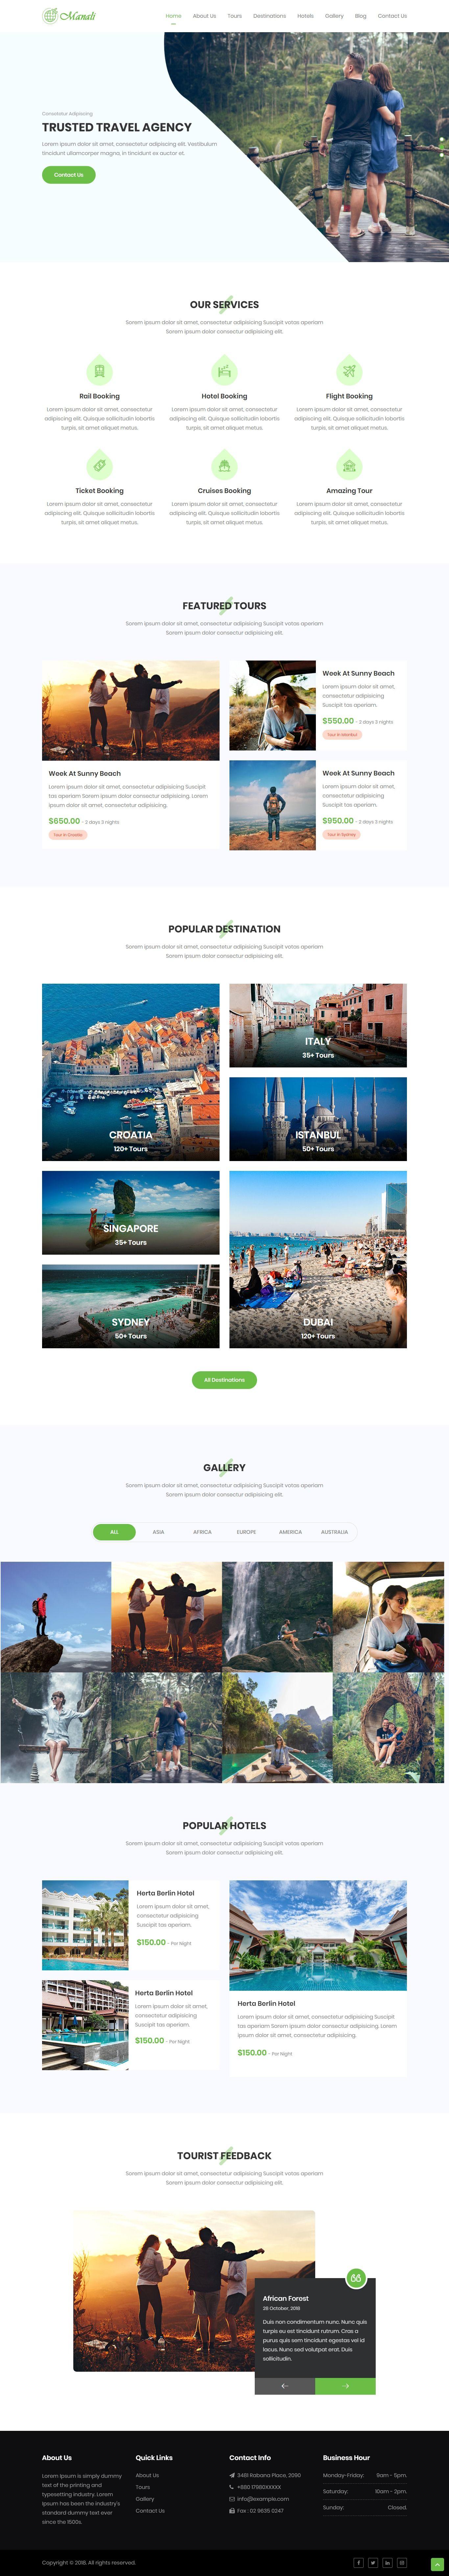 Tour & Travels Agency HTML Website Template | HTML Travel Website